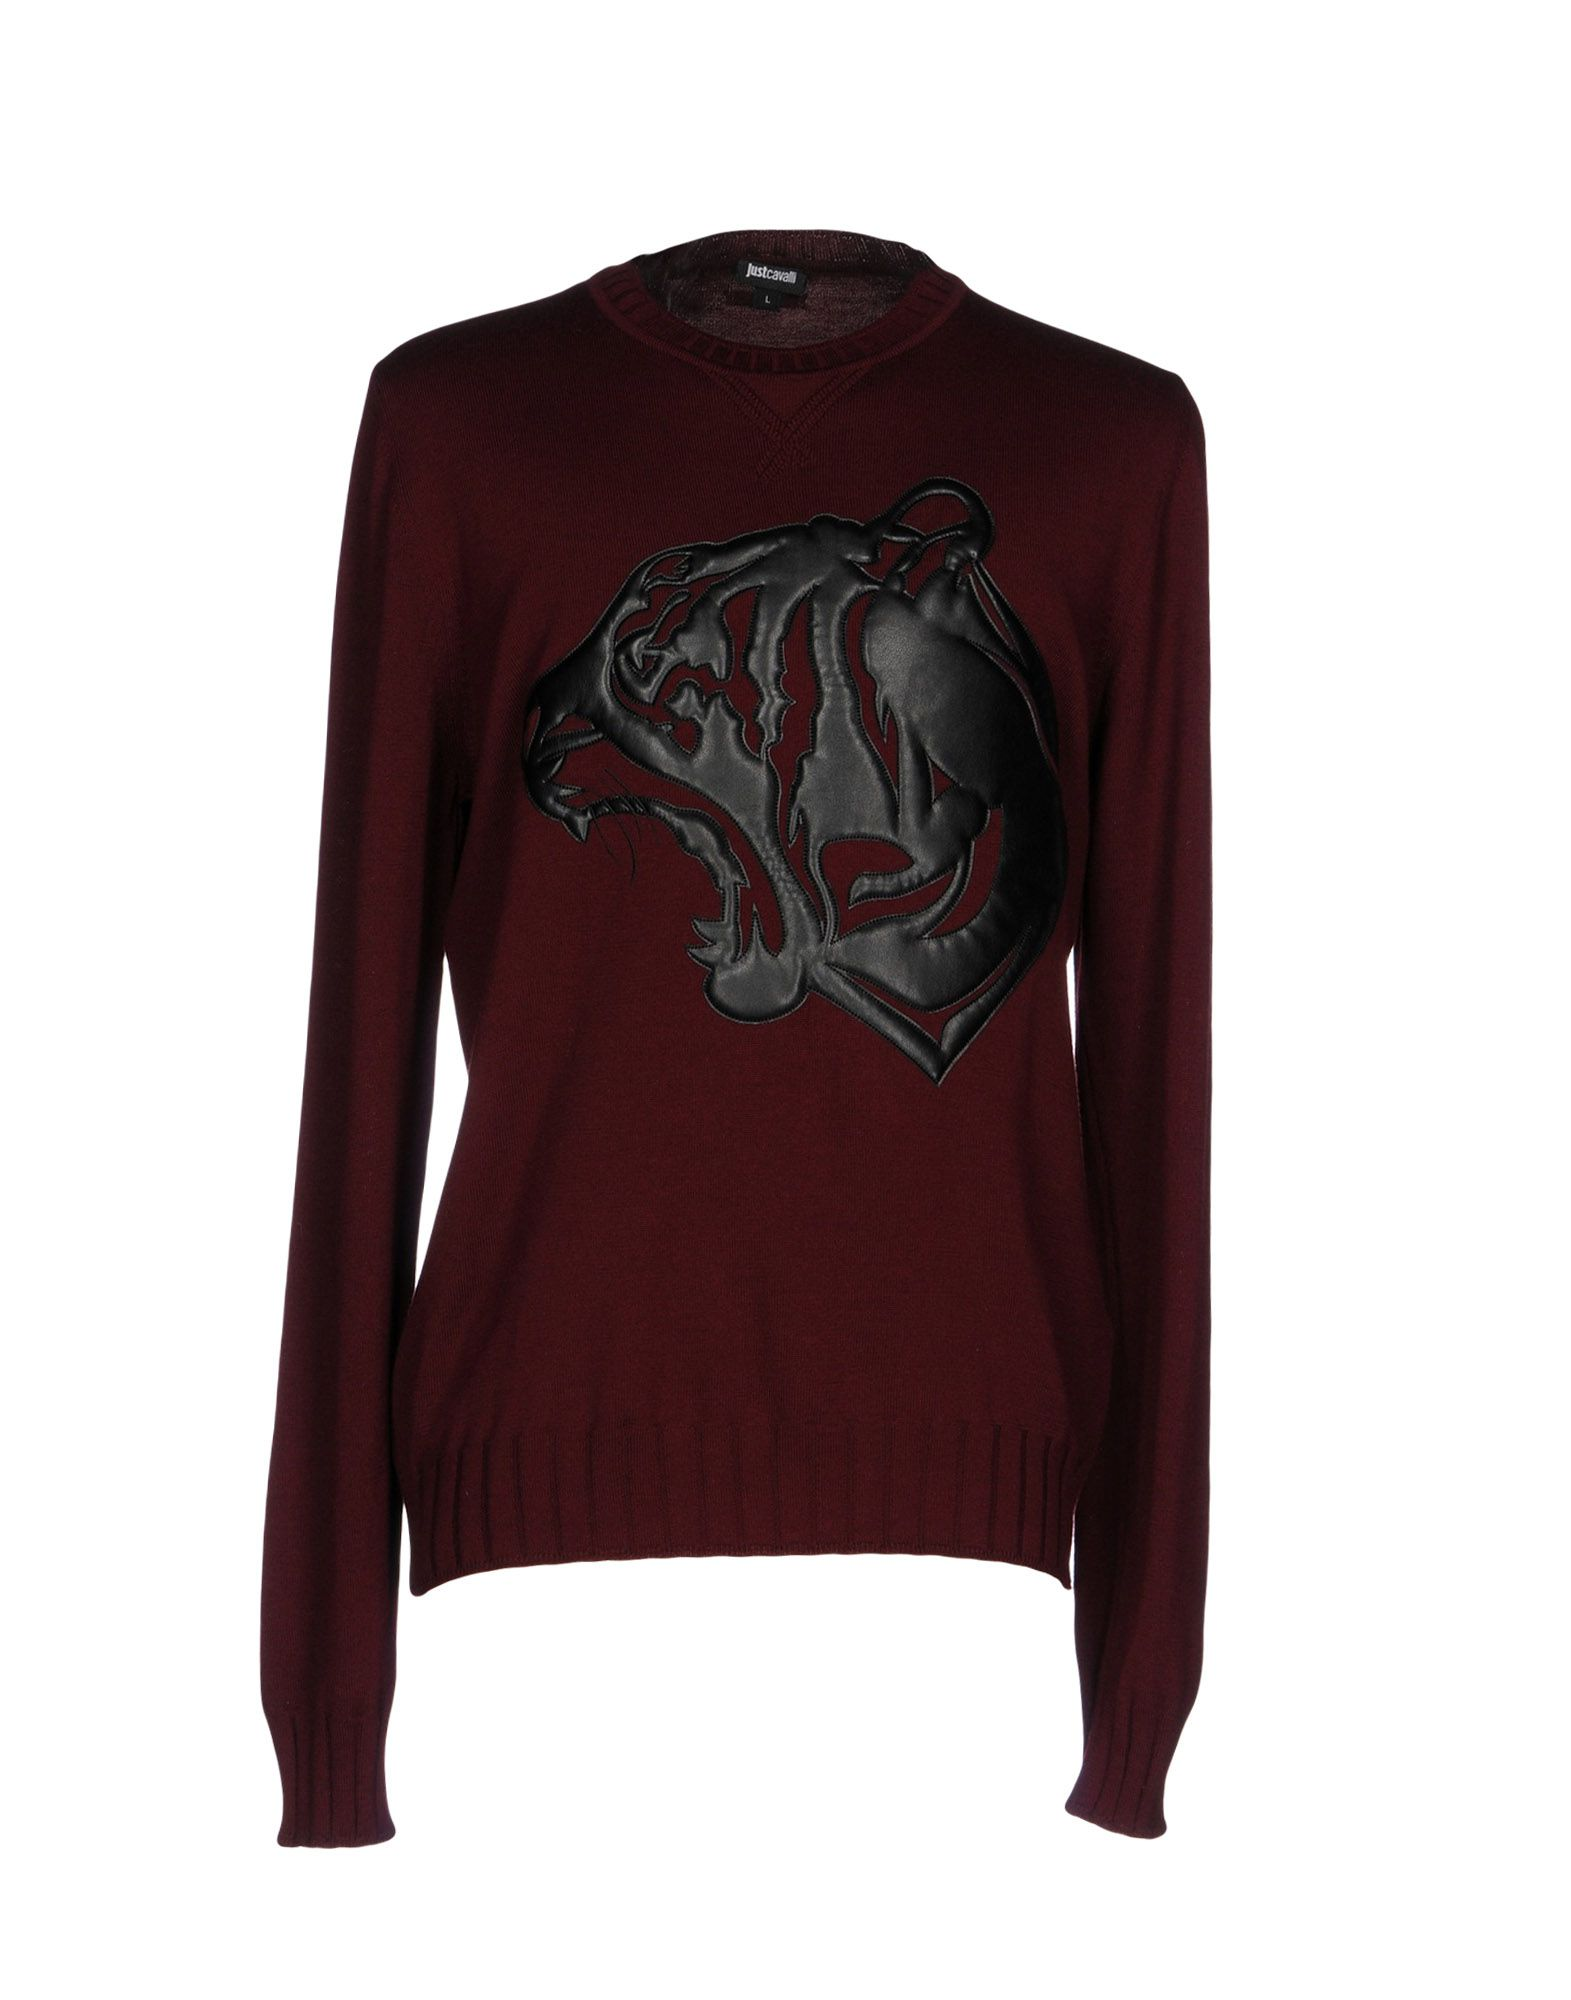 JUST CAVALLI Свитер just cavalli свитер